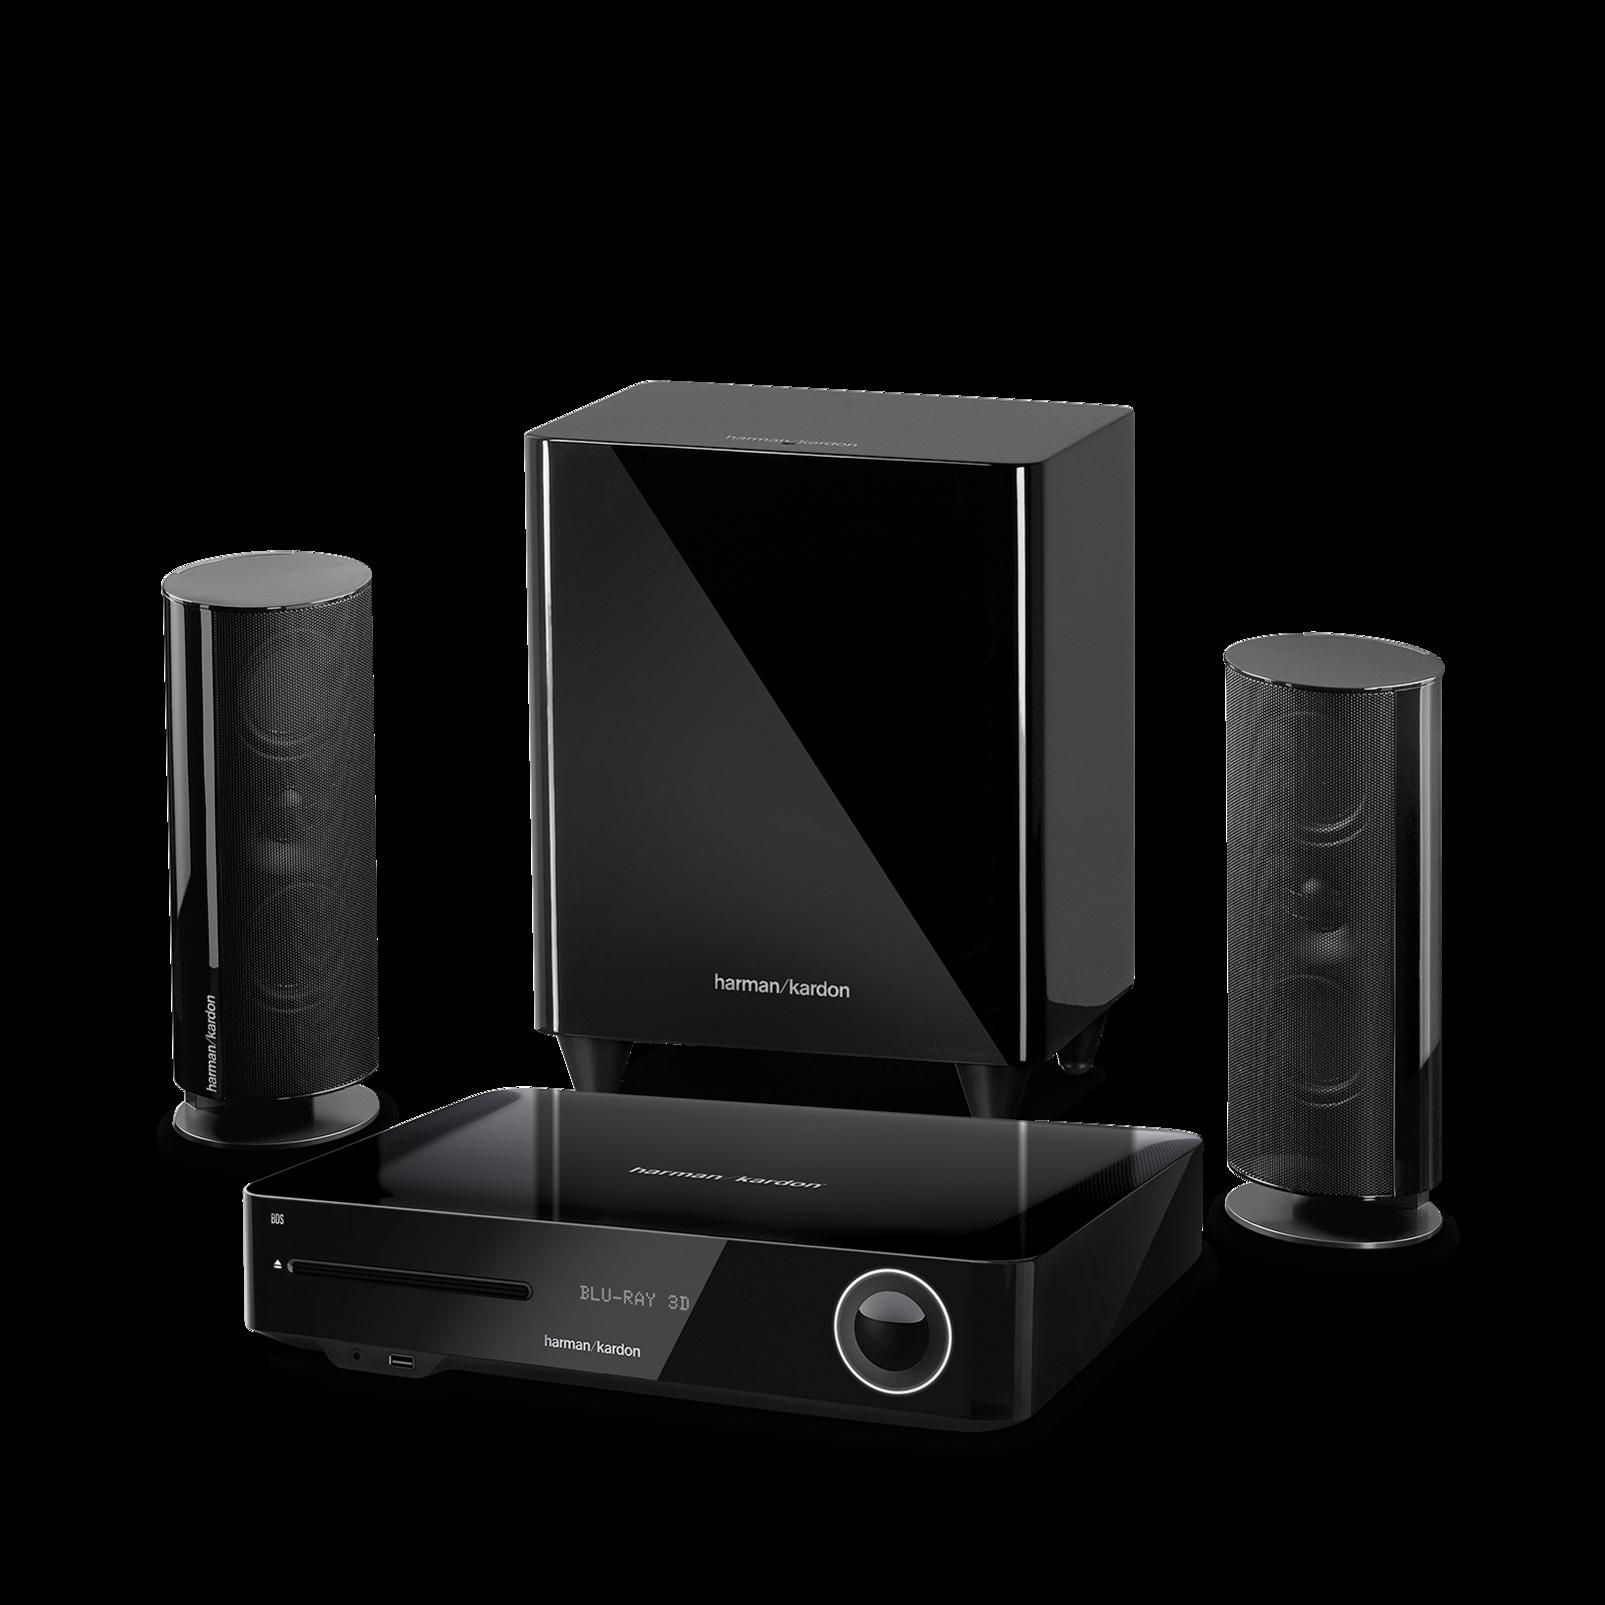 bds 485s home cinema 2 1 blu ray disc upscaling 4k 3d 330 watts avec les technologies. Black Bedroom Furniture Sets. Home Design Ideas